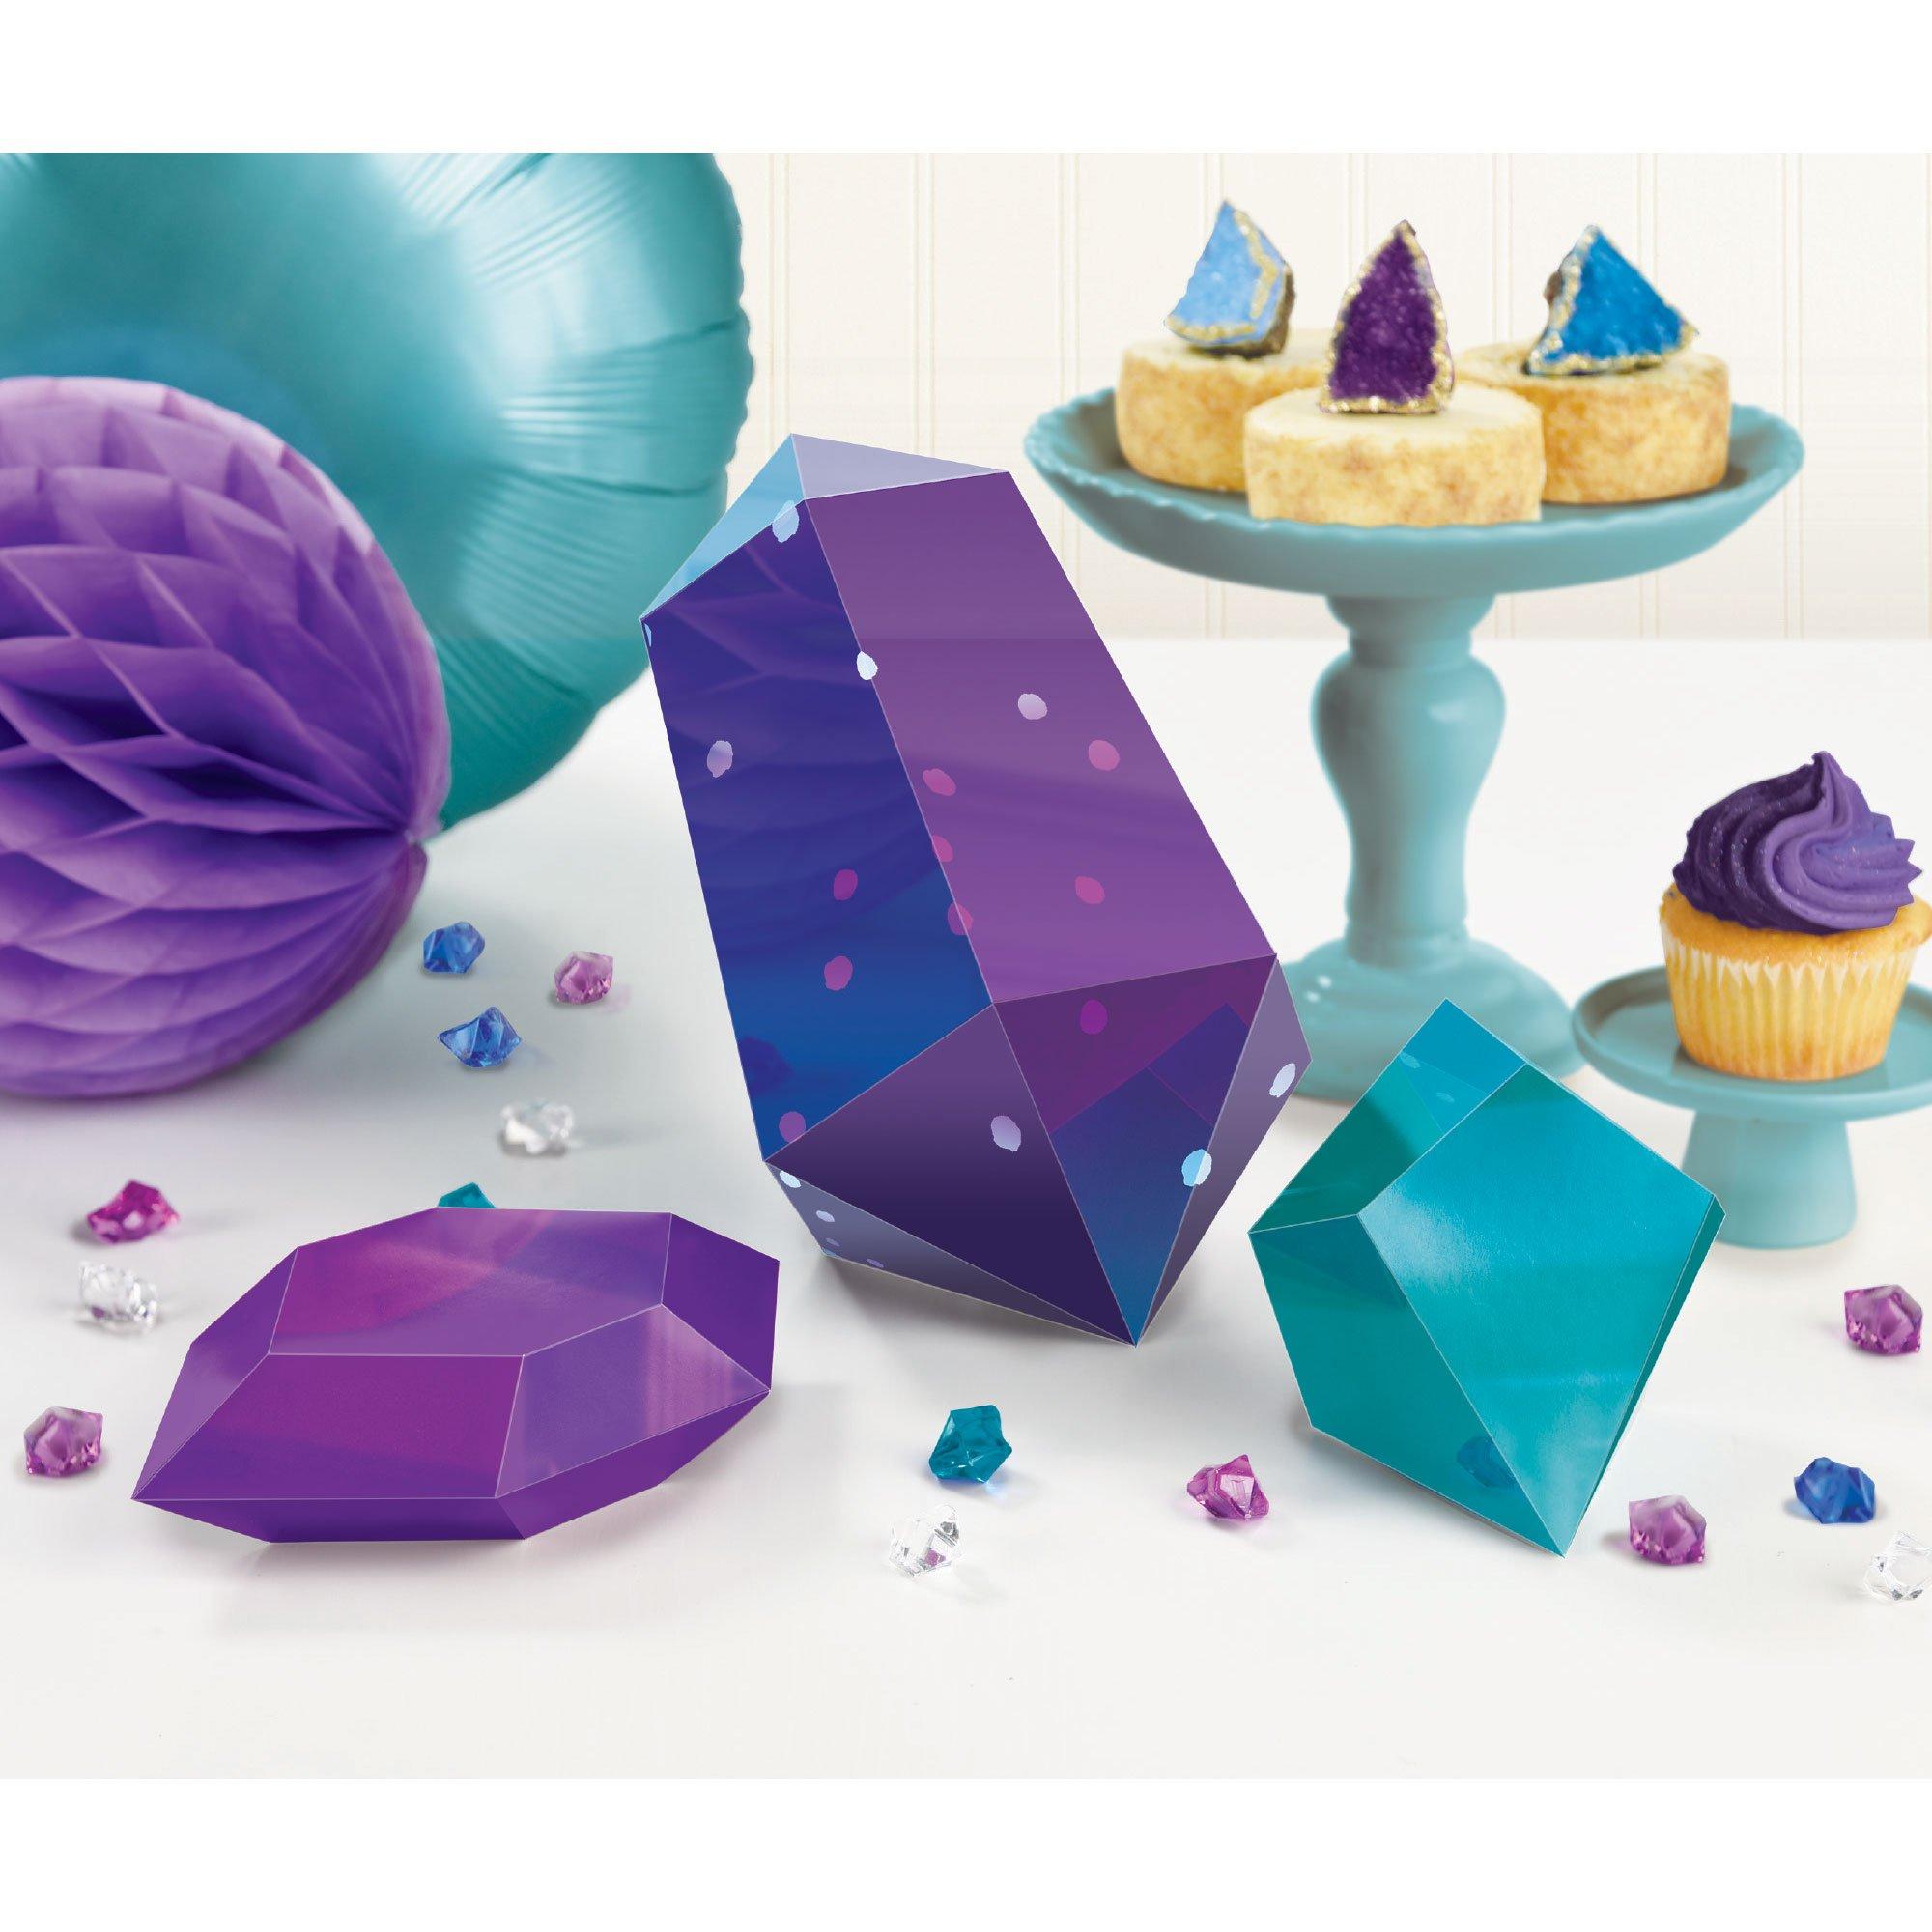 Sparkling Sapphire 3D Table Decorating Kit